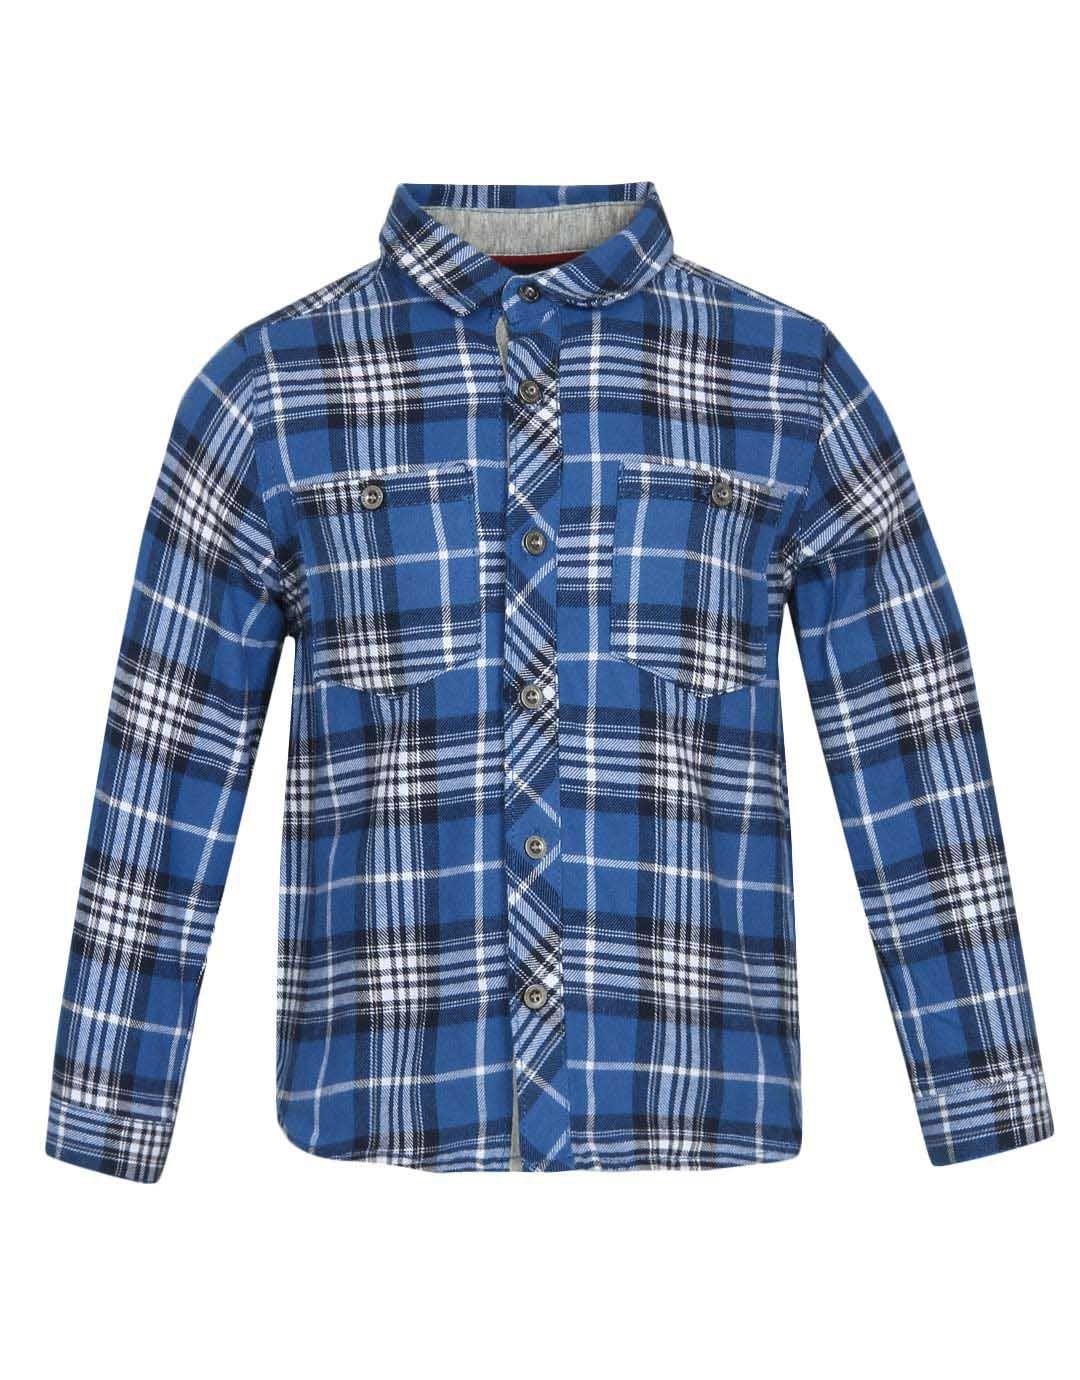 Mothercare Boys Blue Shirt